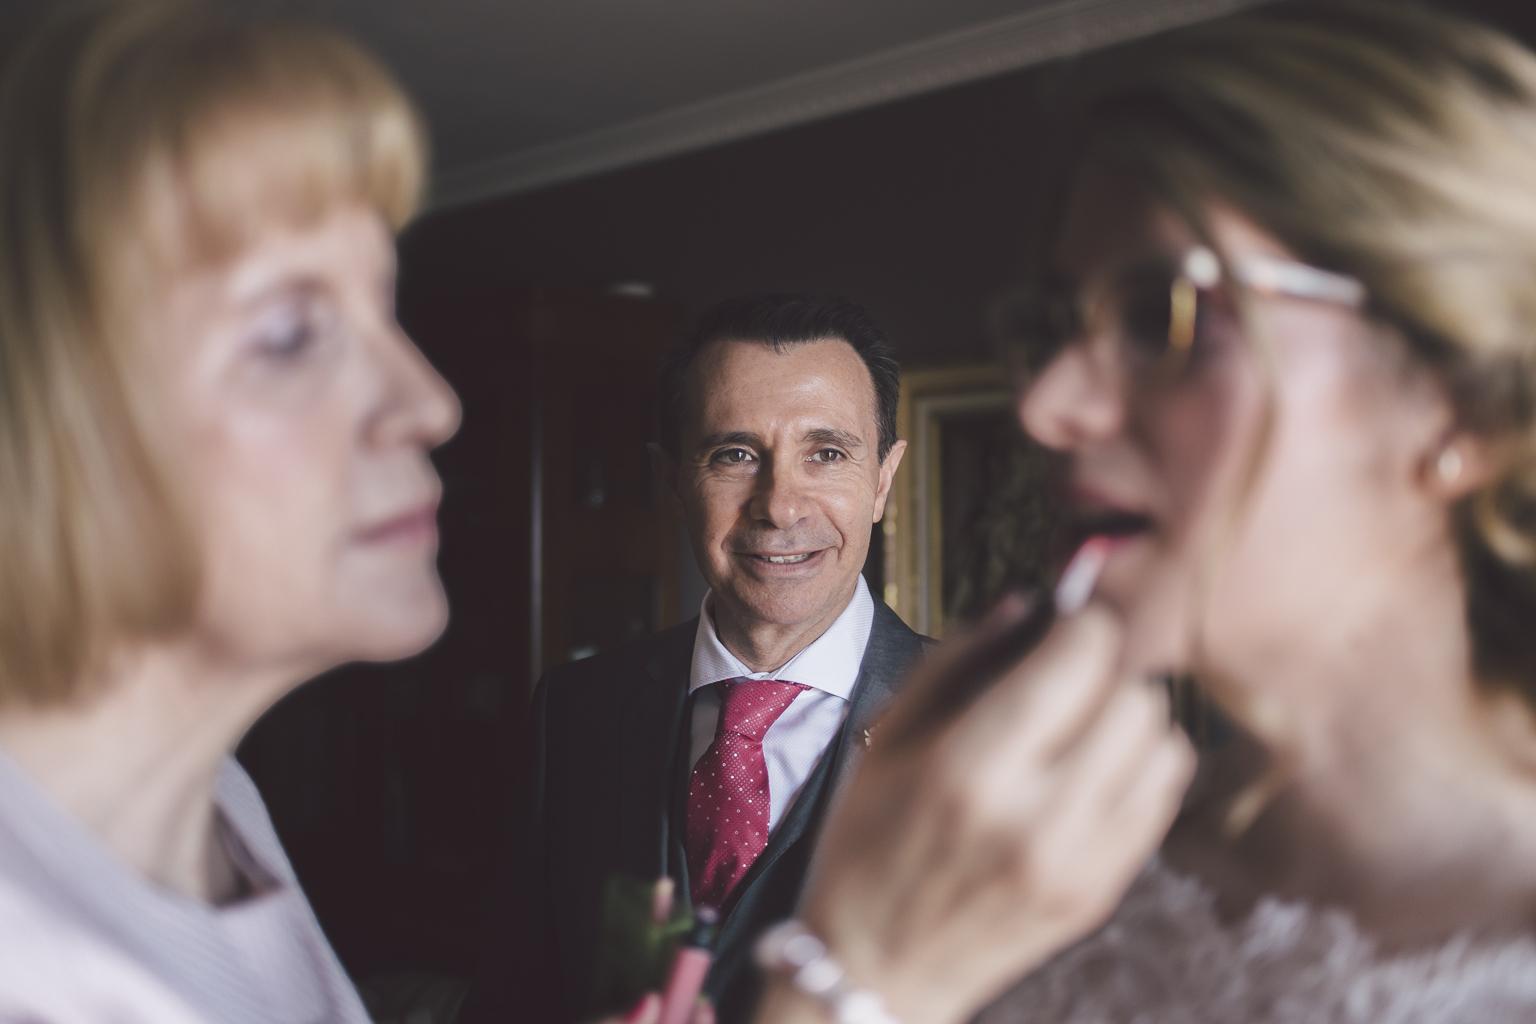 fotógrafo de bodas Sant Cugat :: fotógrafo de bodas Barcelona :: La Ópera Benicassim :: Destiny wedding